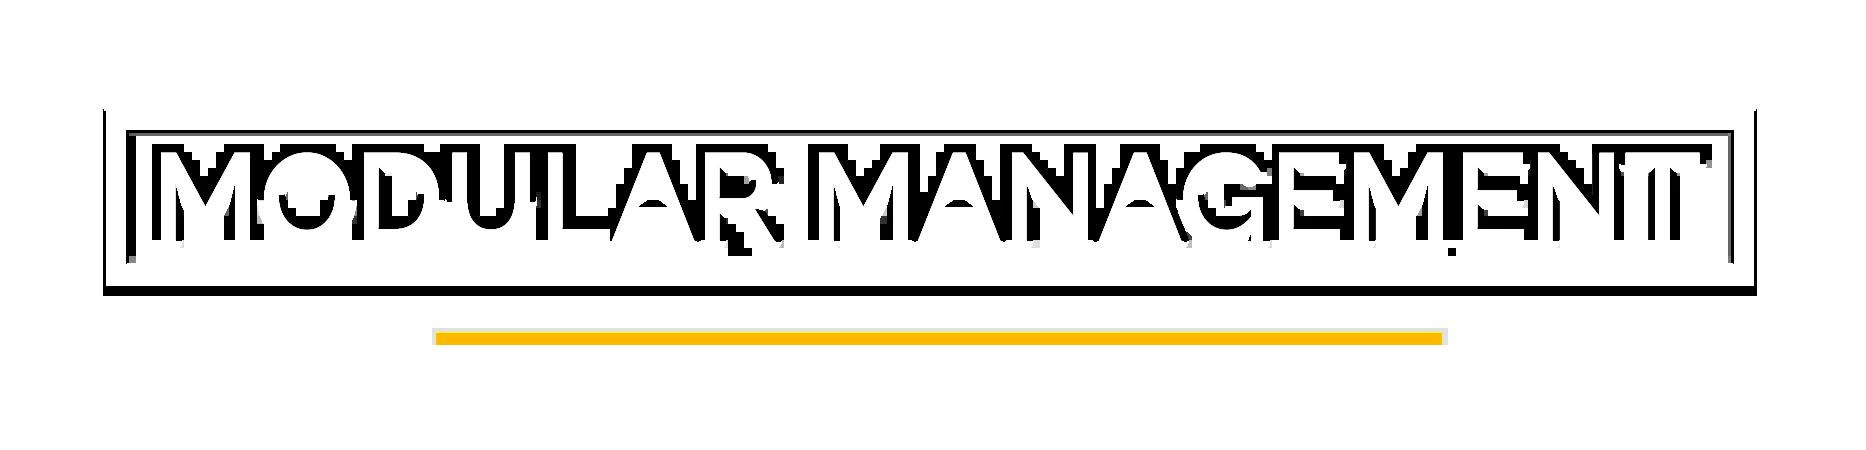 Modular Management